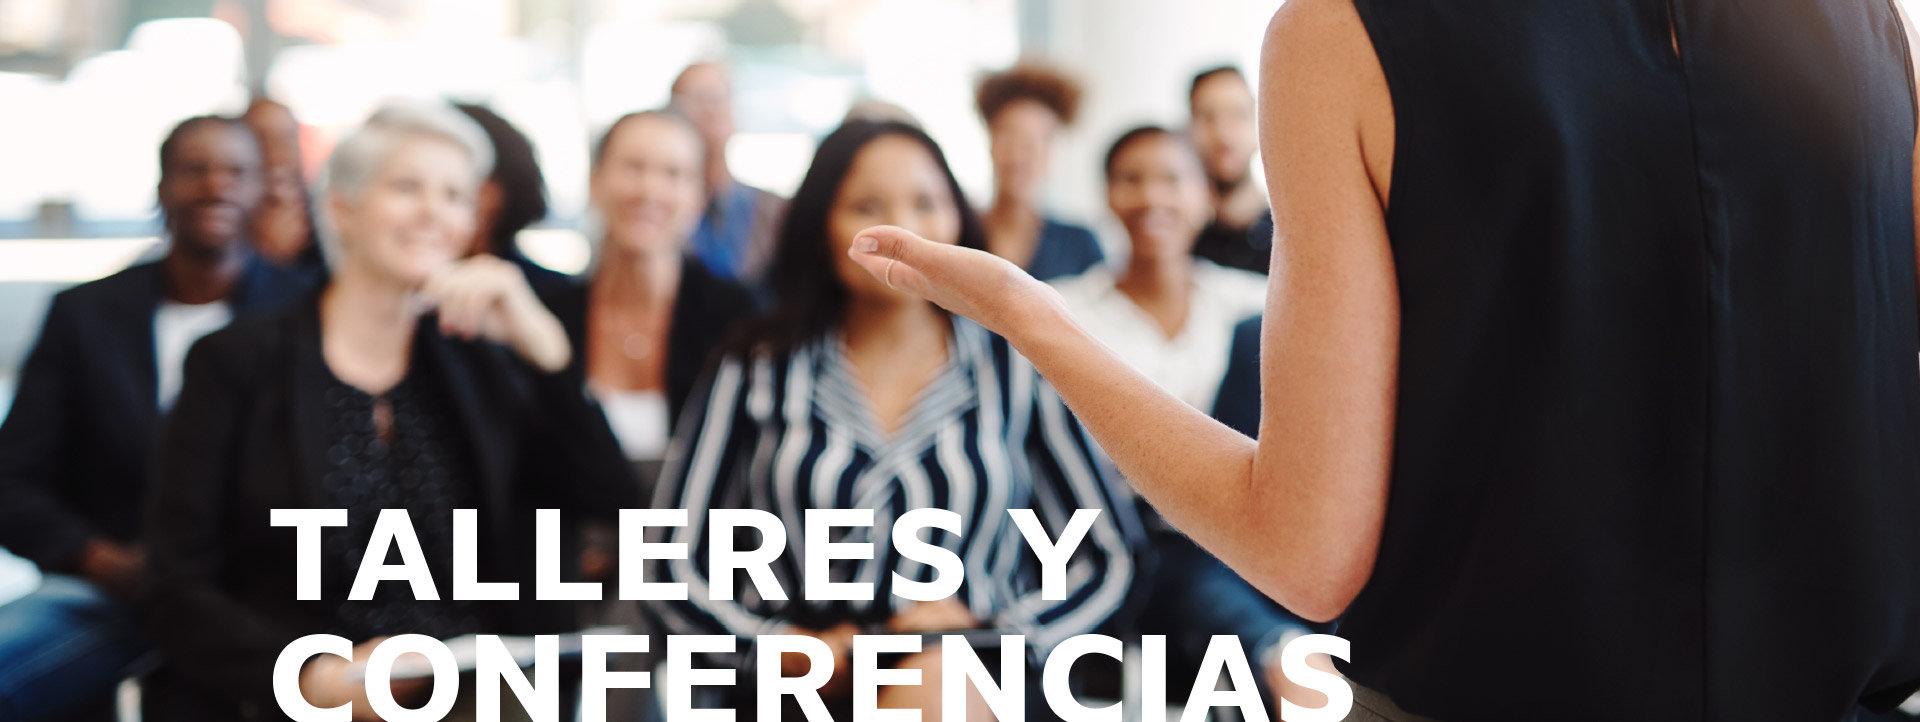 talleres-conferencias-hero-banner.jpg